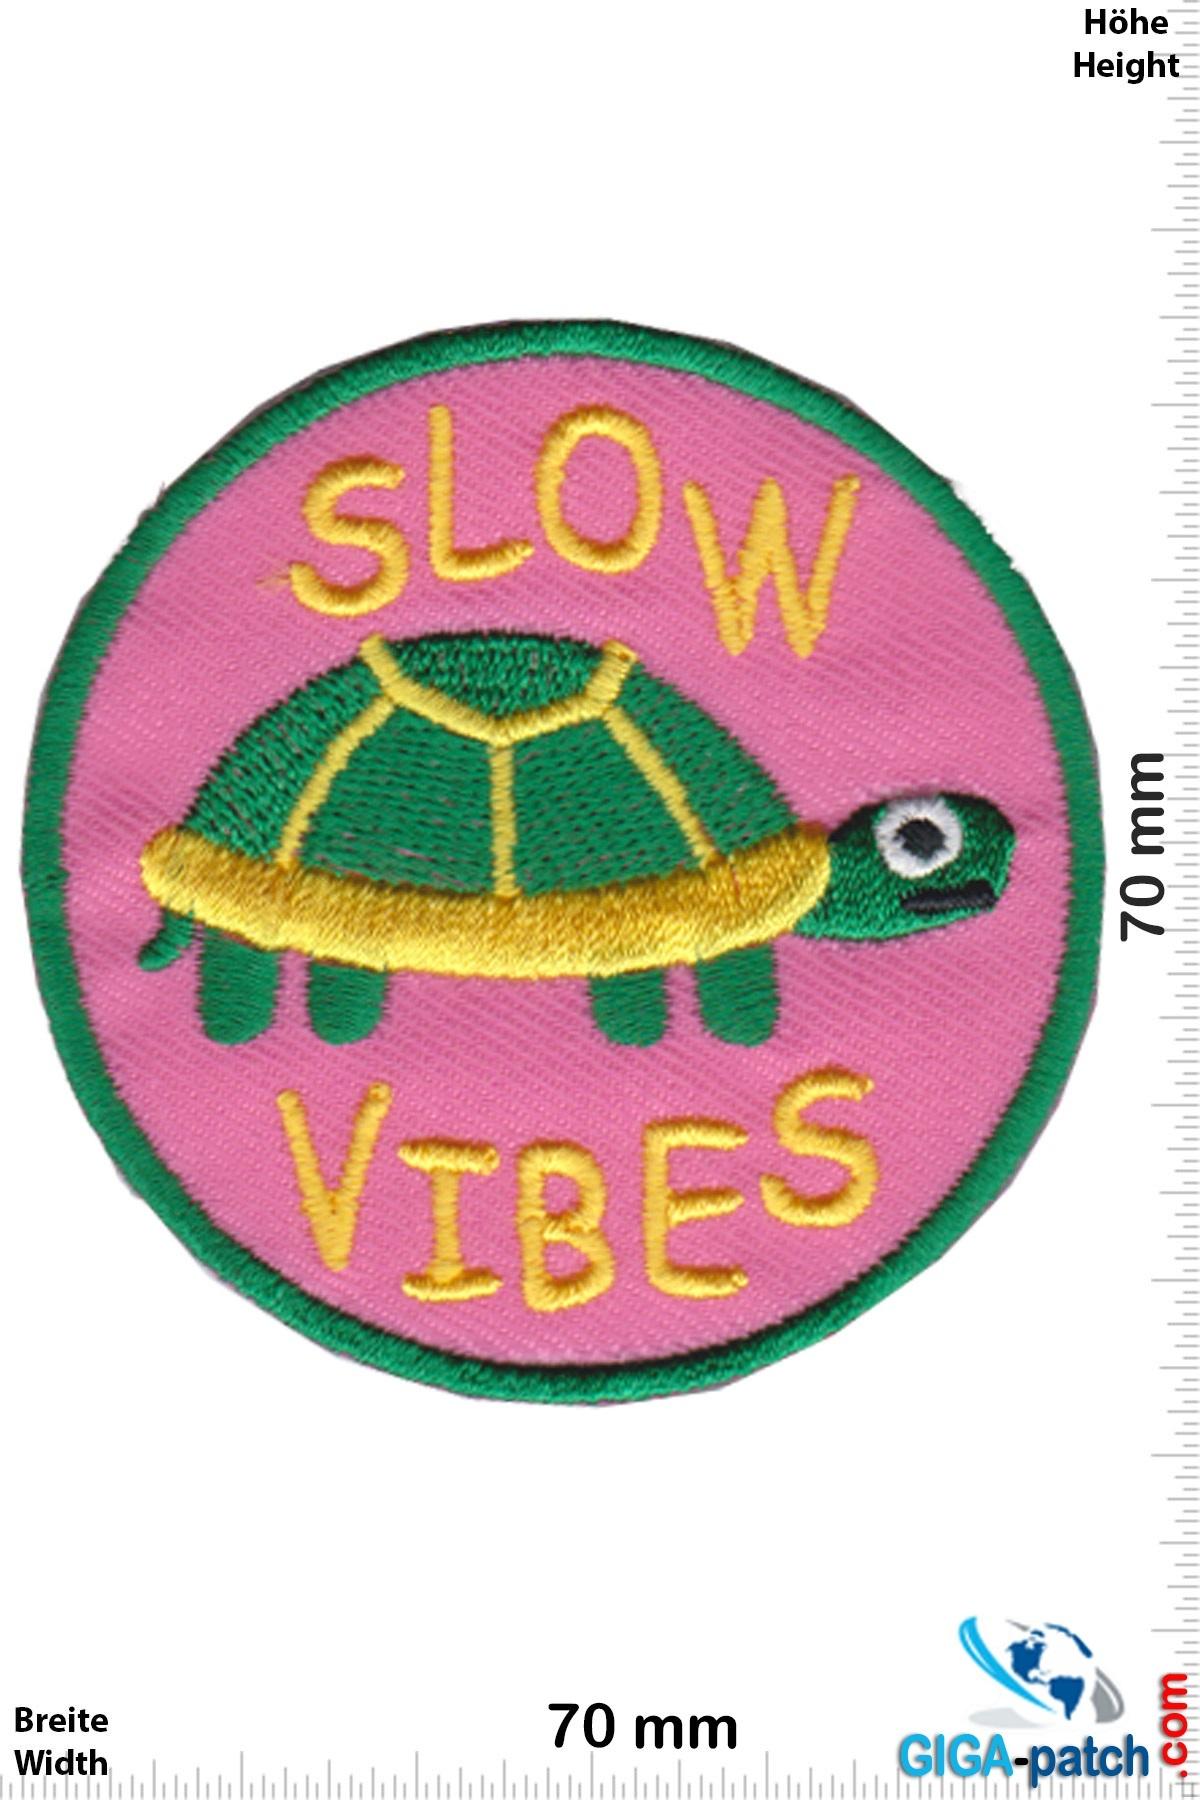 Fun Slow Vibes